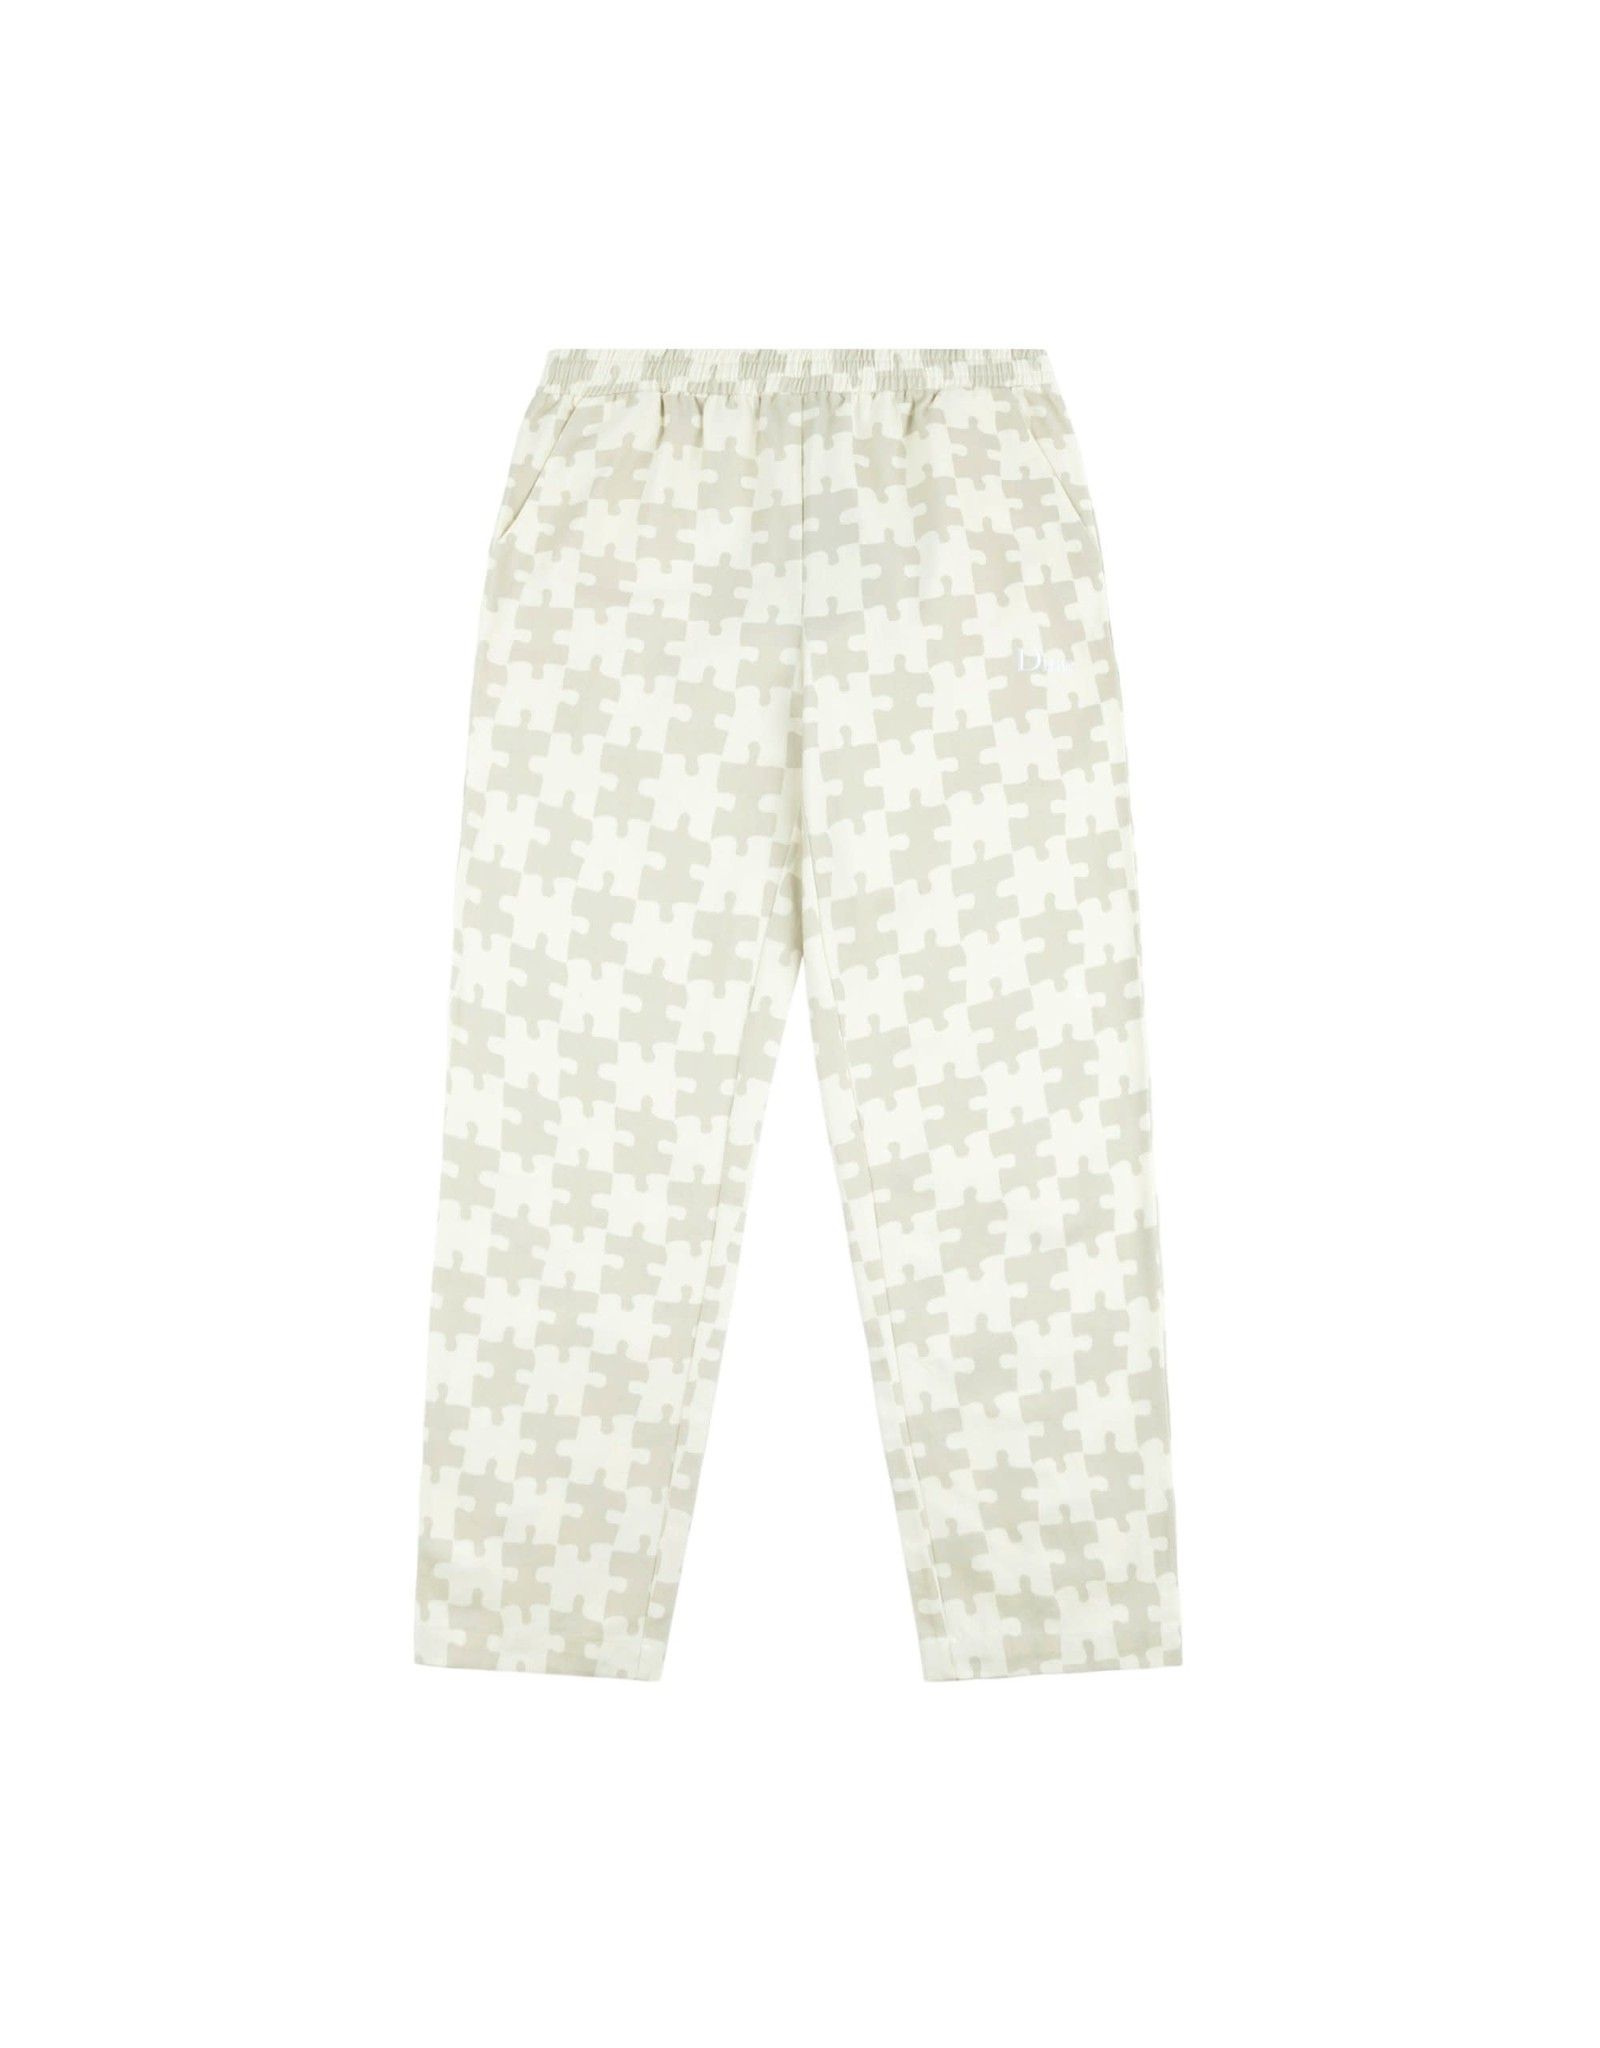 Dime Puzzle Twill Pants - Cream